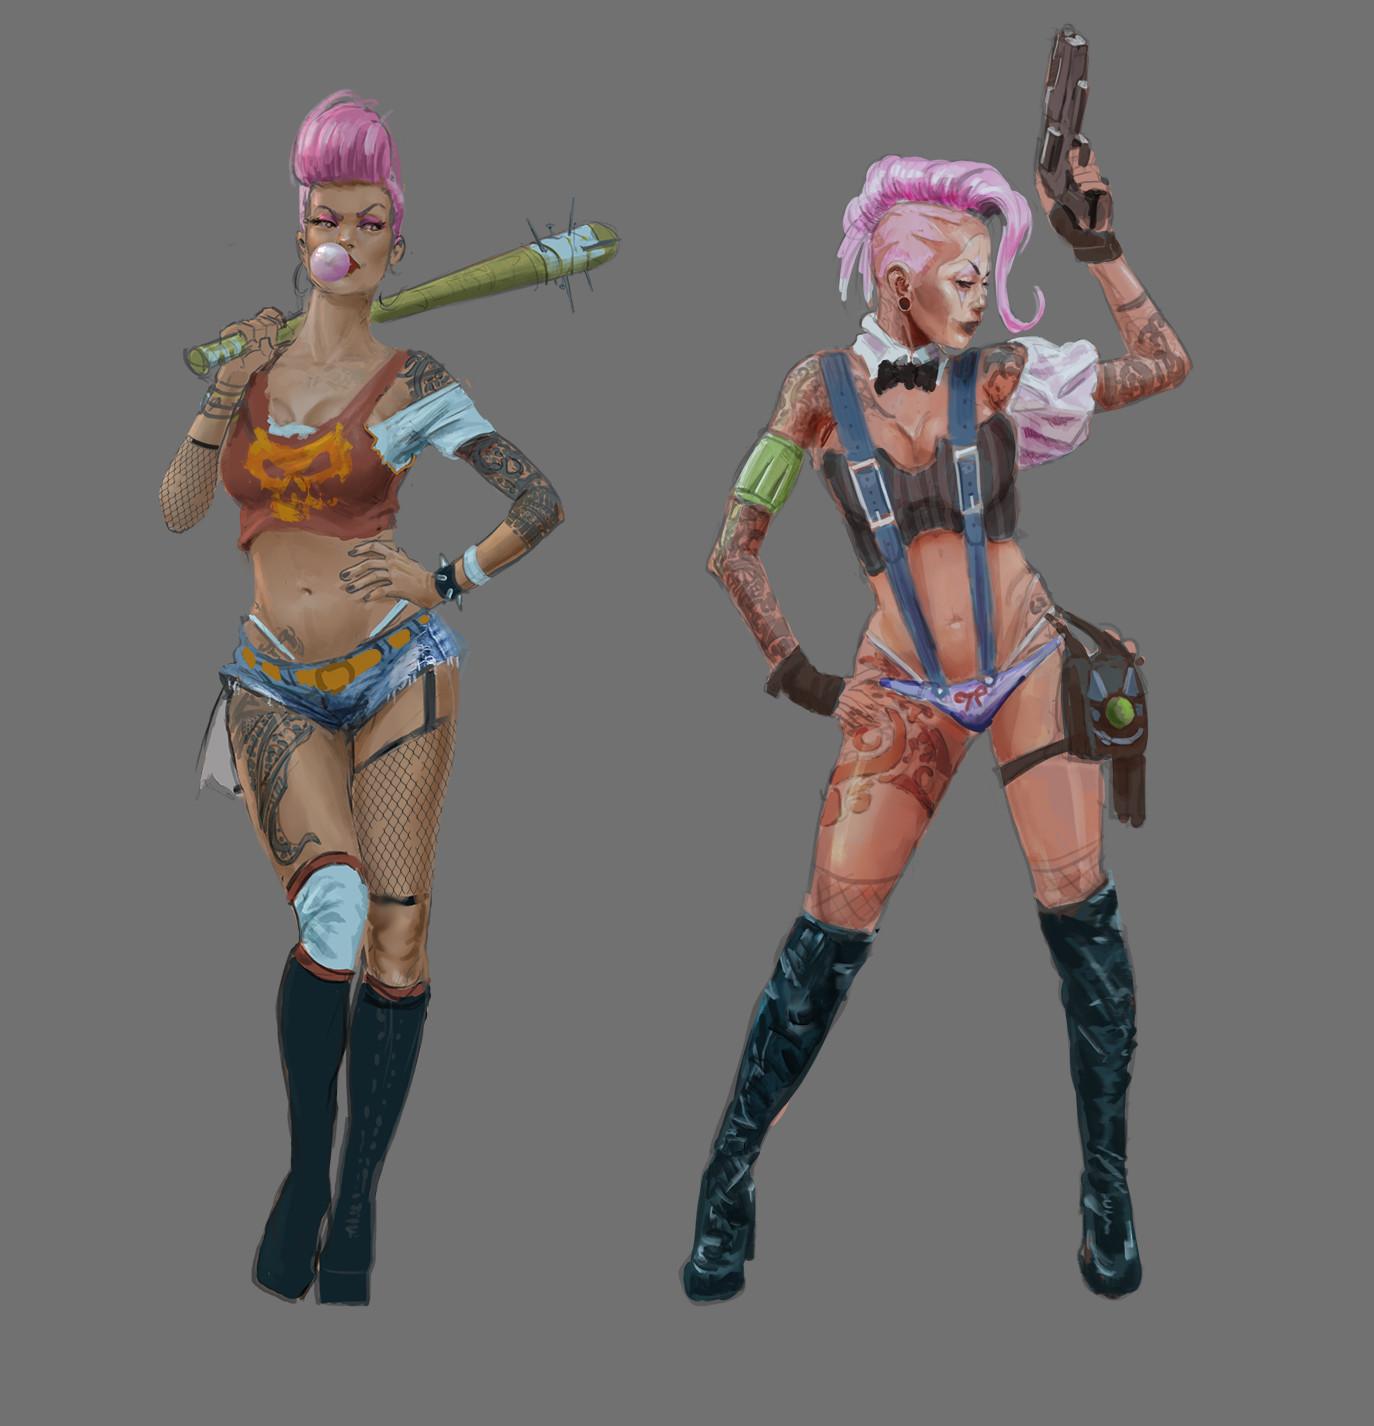 quick color concepts!